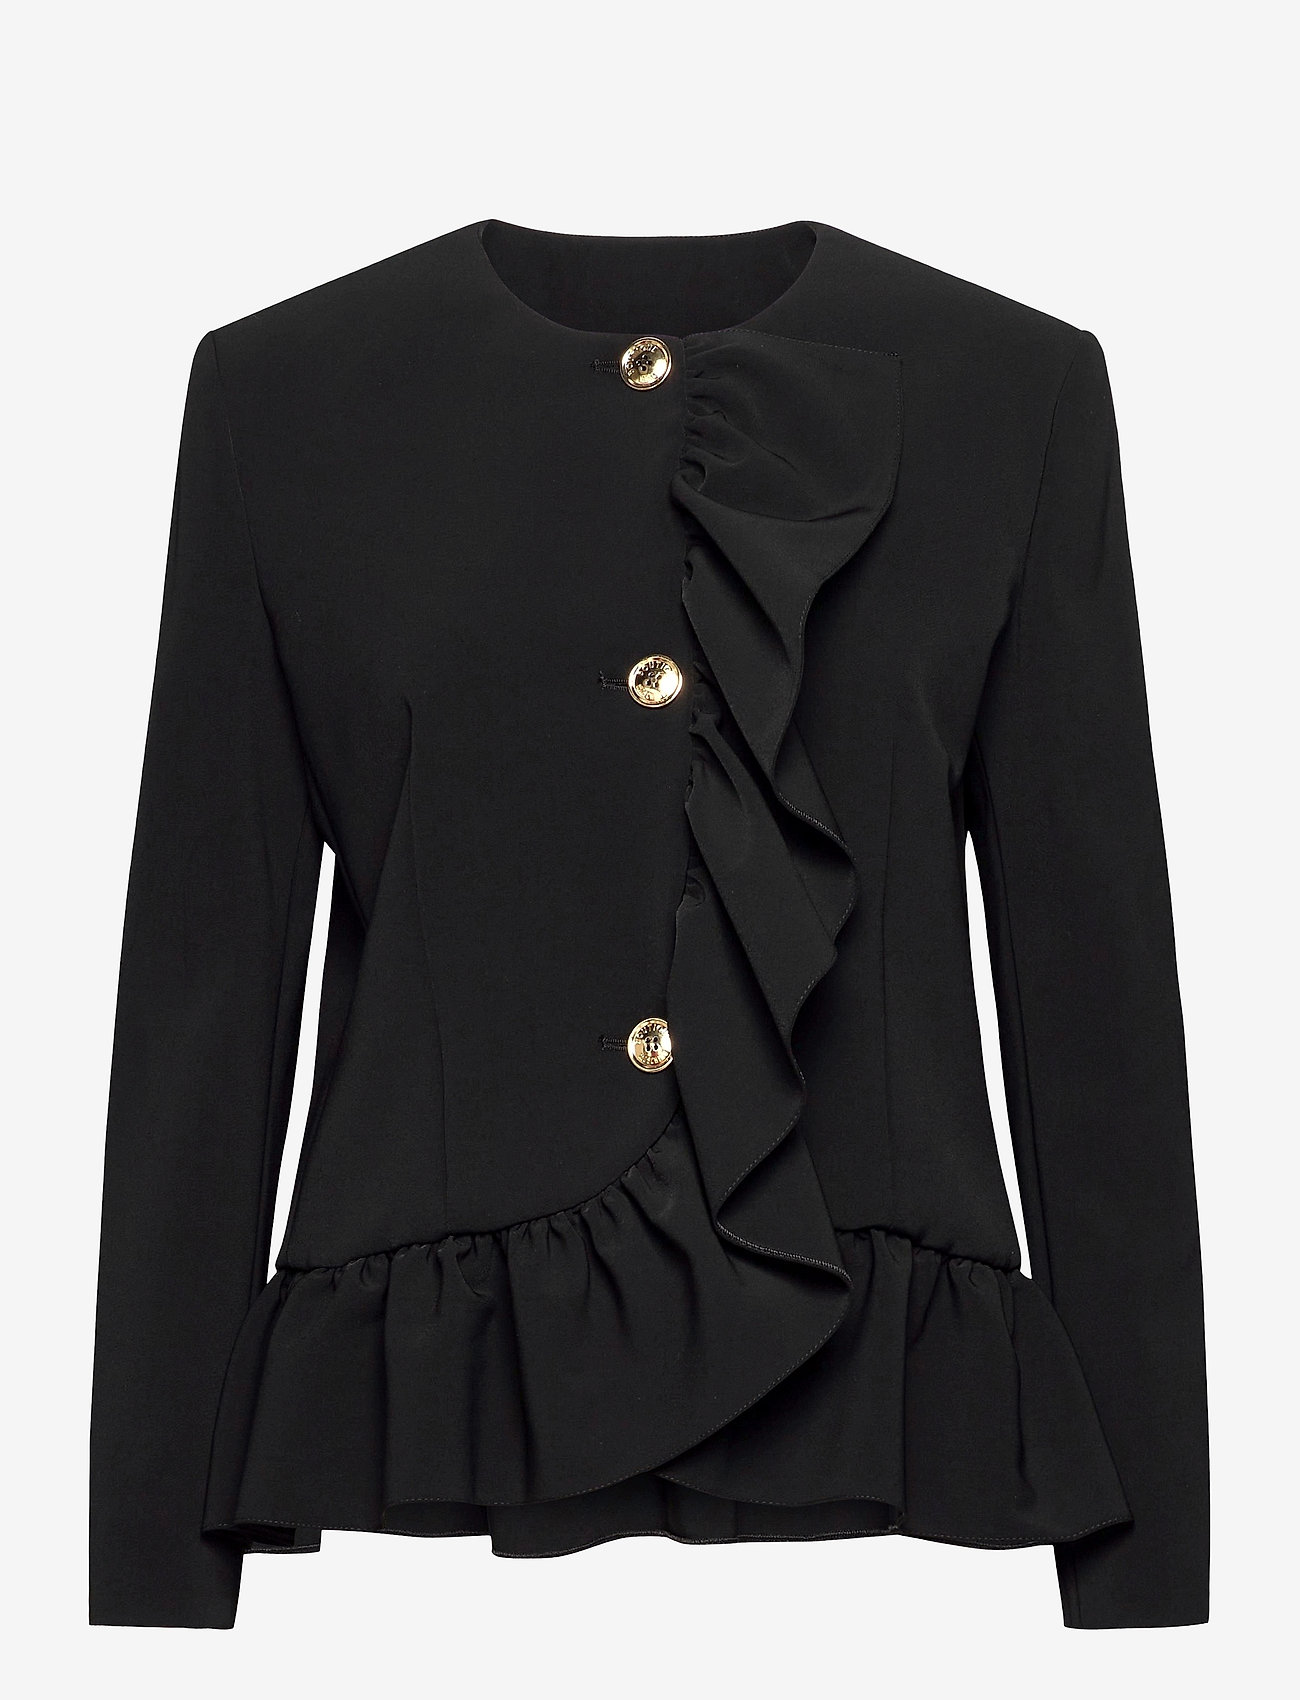 Boutique Moschino - Boutique Moschino JACKET - tøj - black - 0